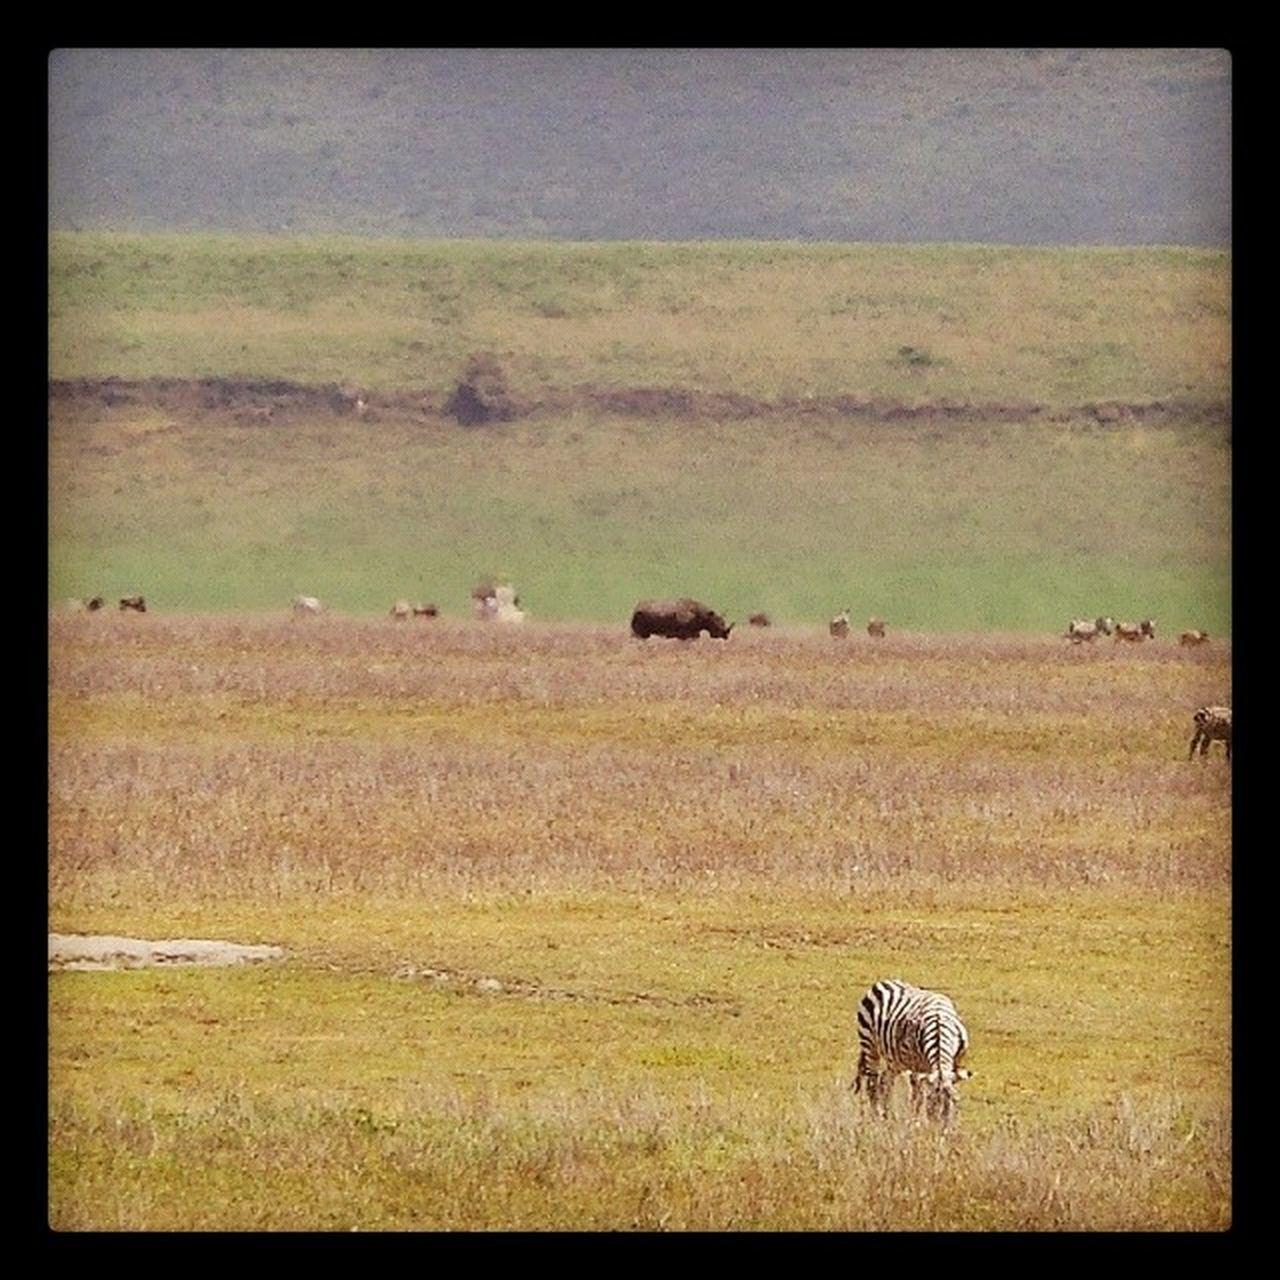 animals in the wild, animal themes, grass, mammal, wildlife, landscape, safari animals, animal, animal wildlife, nature, no people, day, scenics, outdoors, travel destinations, one animal, beauty in nature